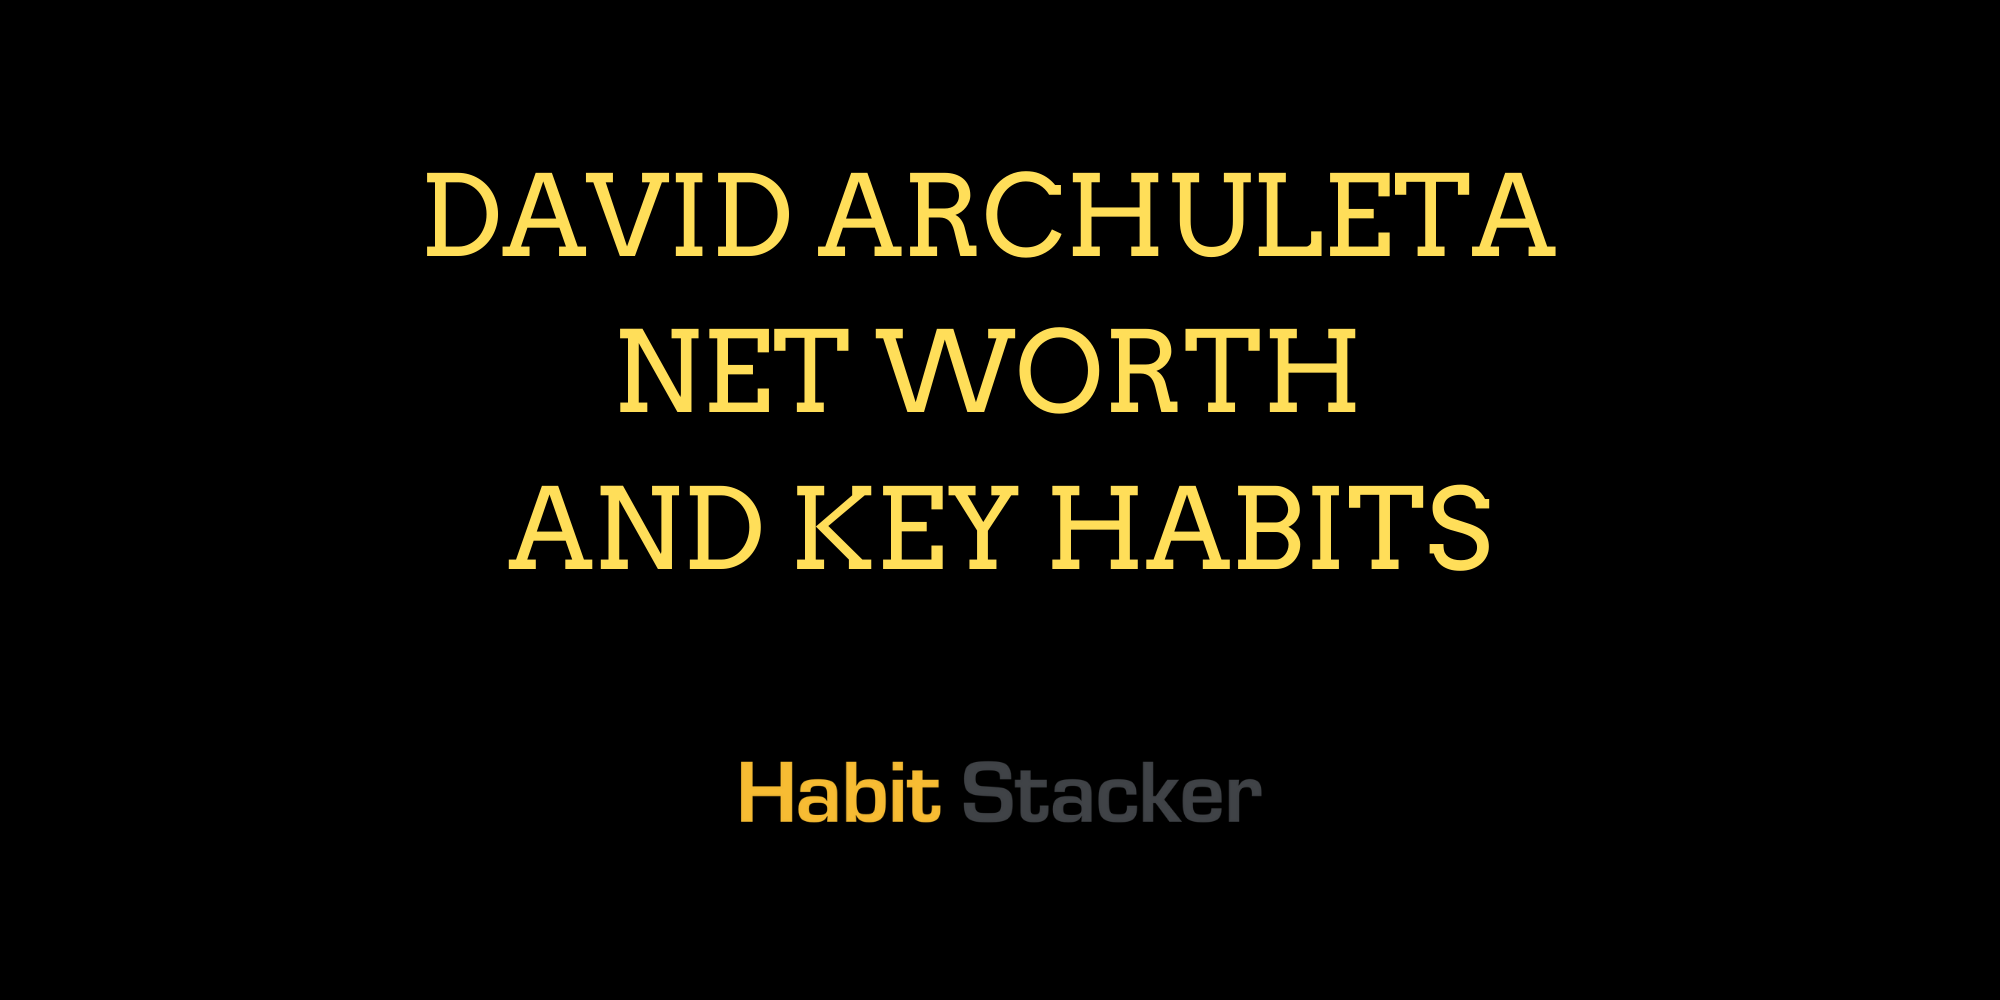 David Archuleta Net Worth and Key Habits